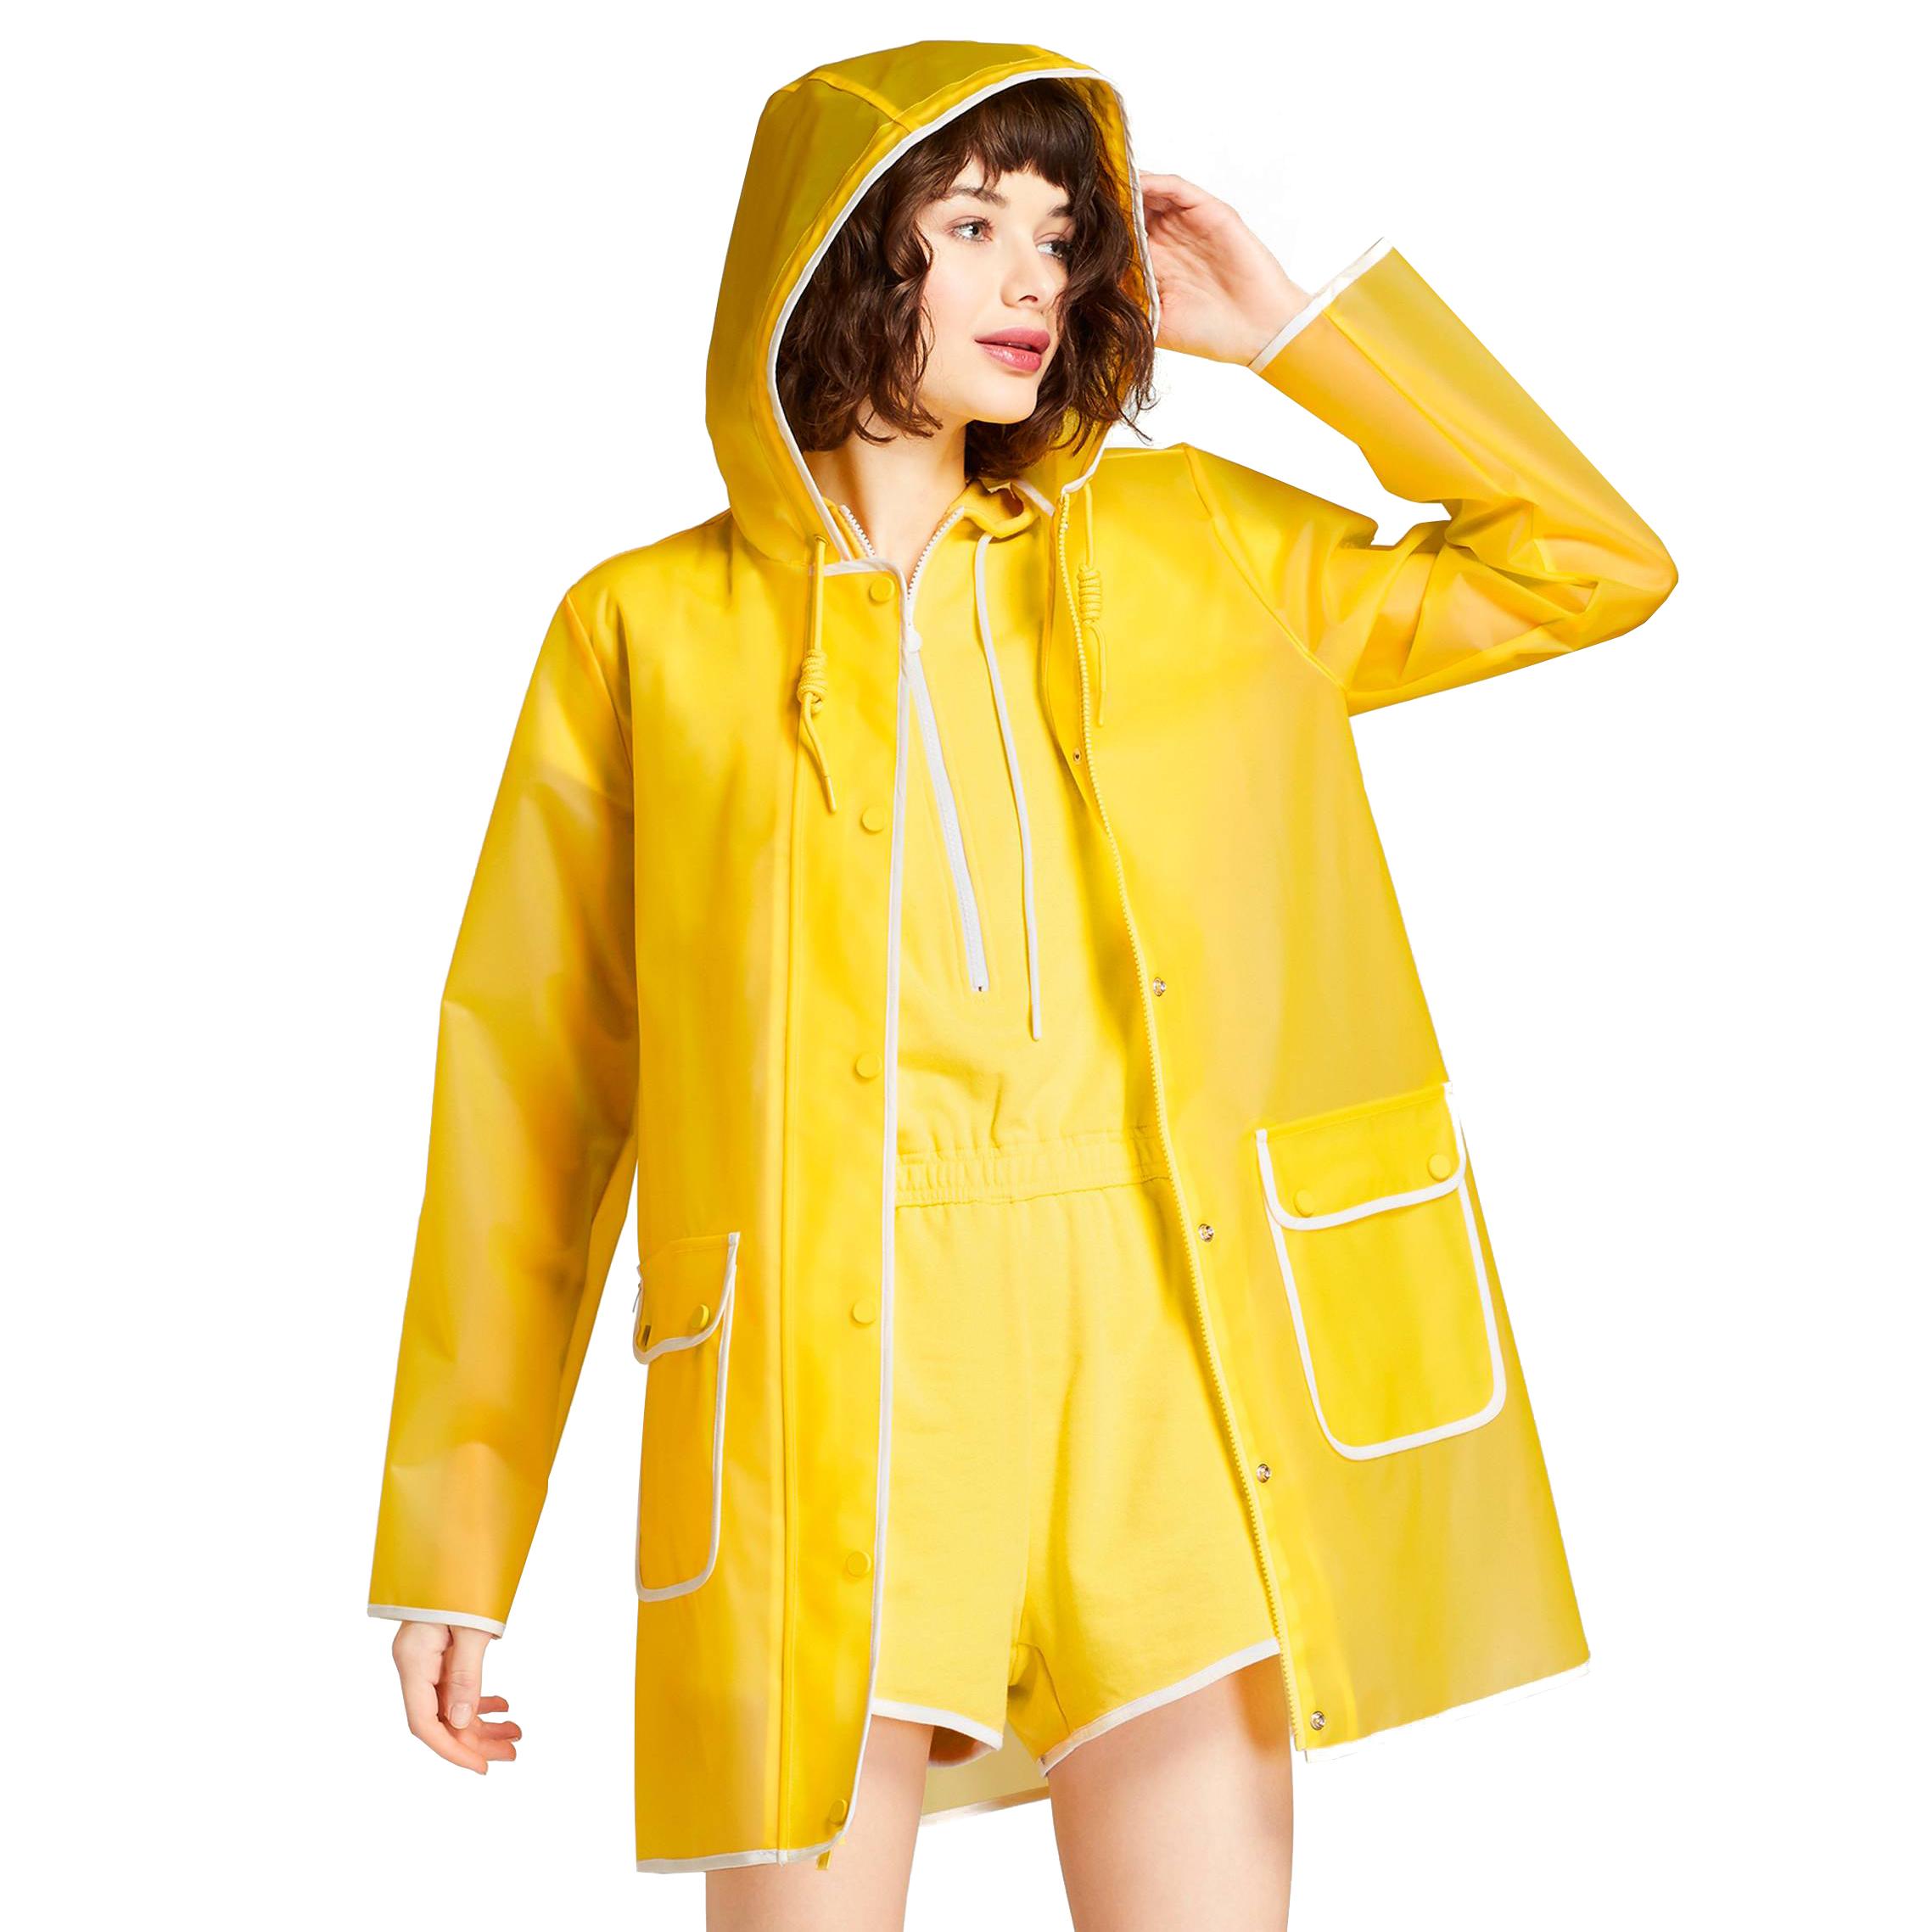 Women's Rain Coat Yellow, $45